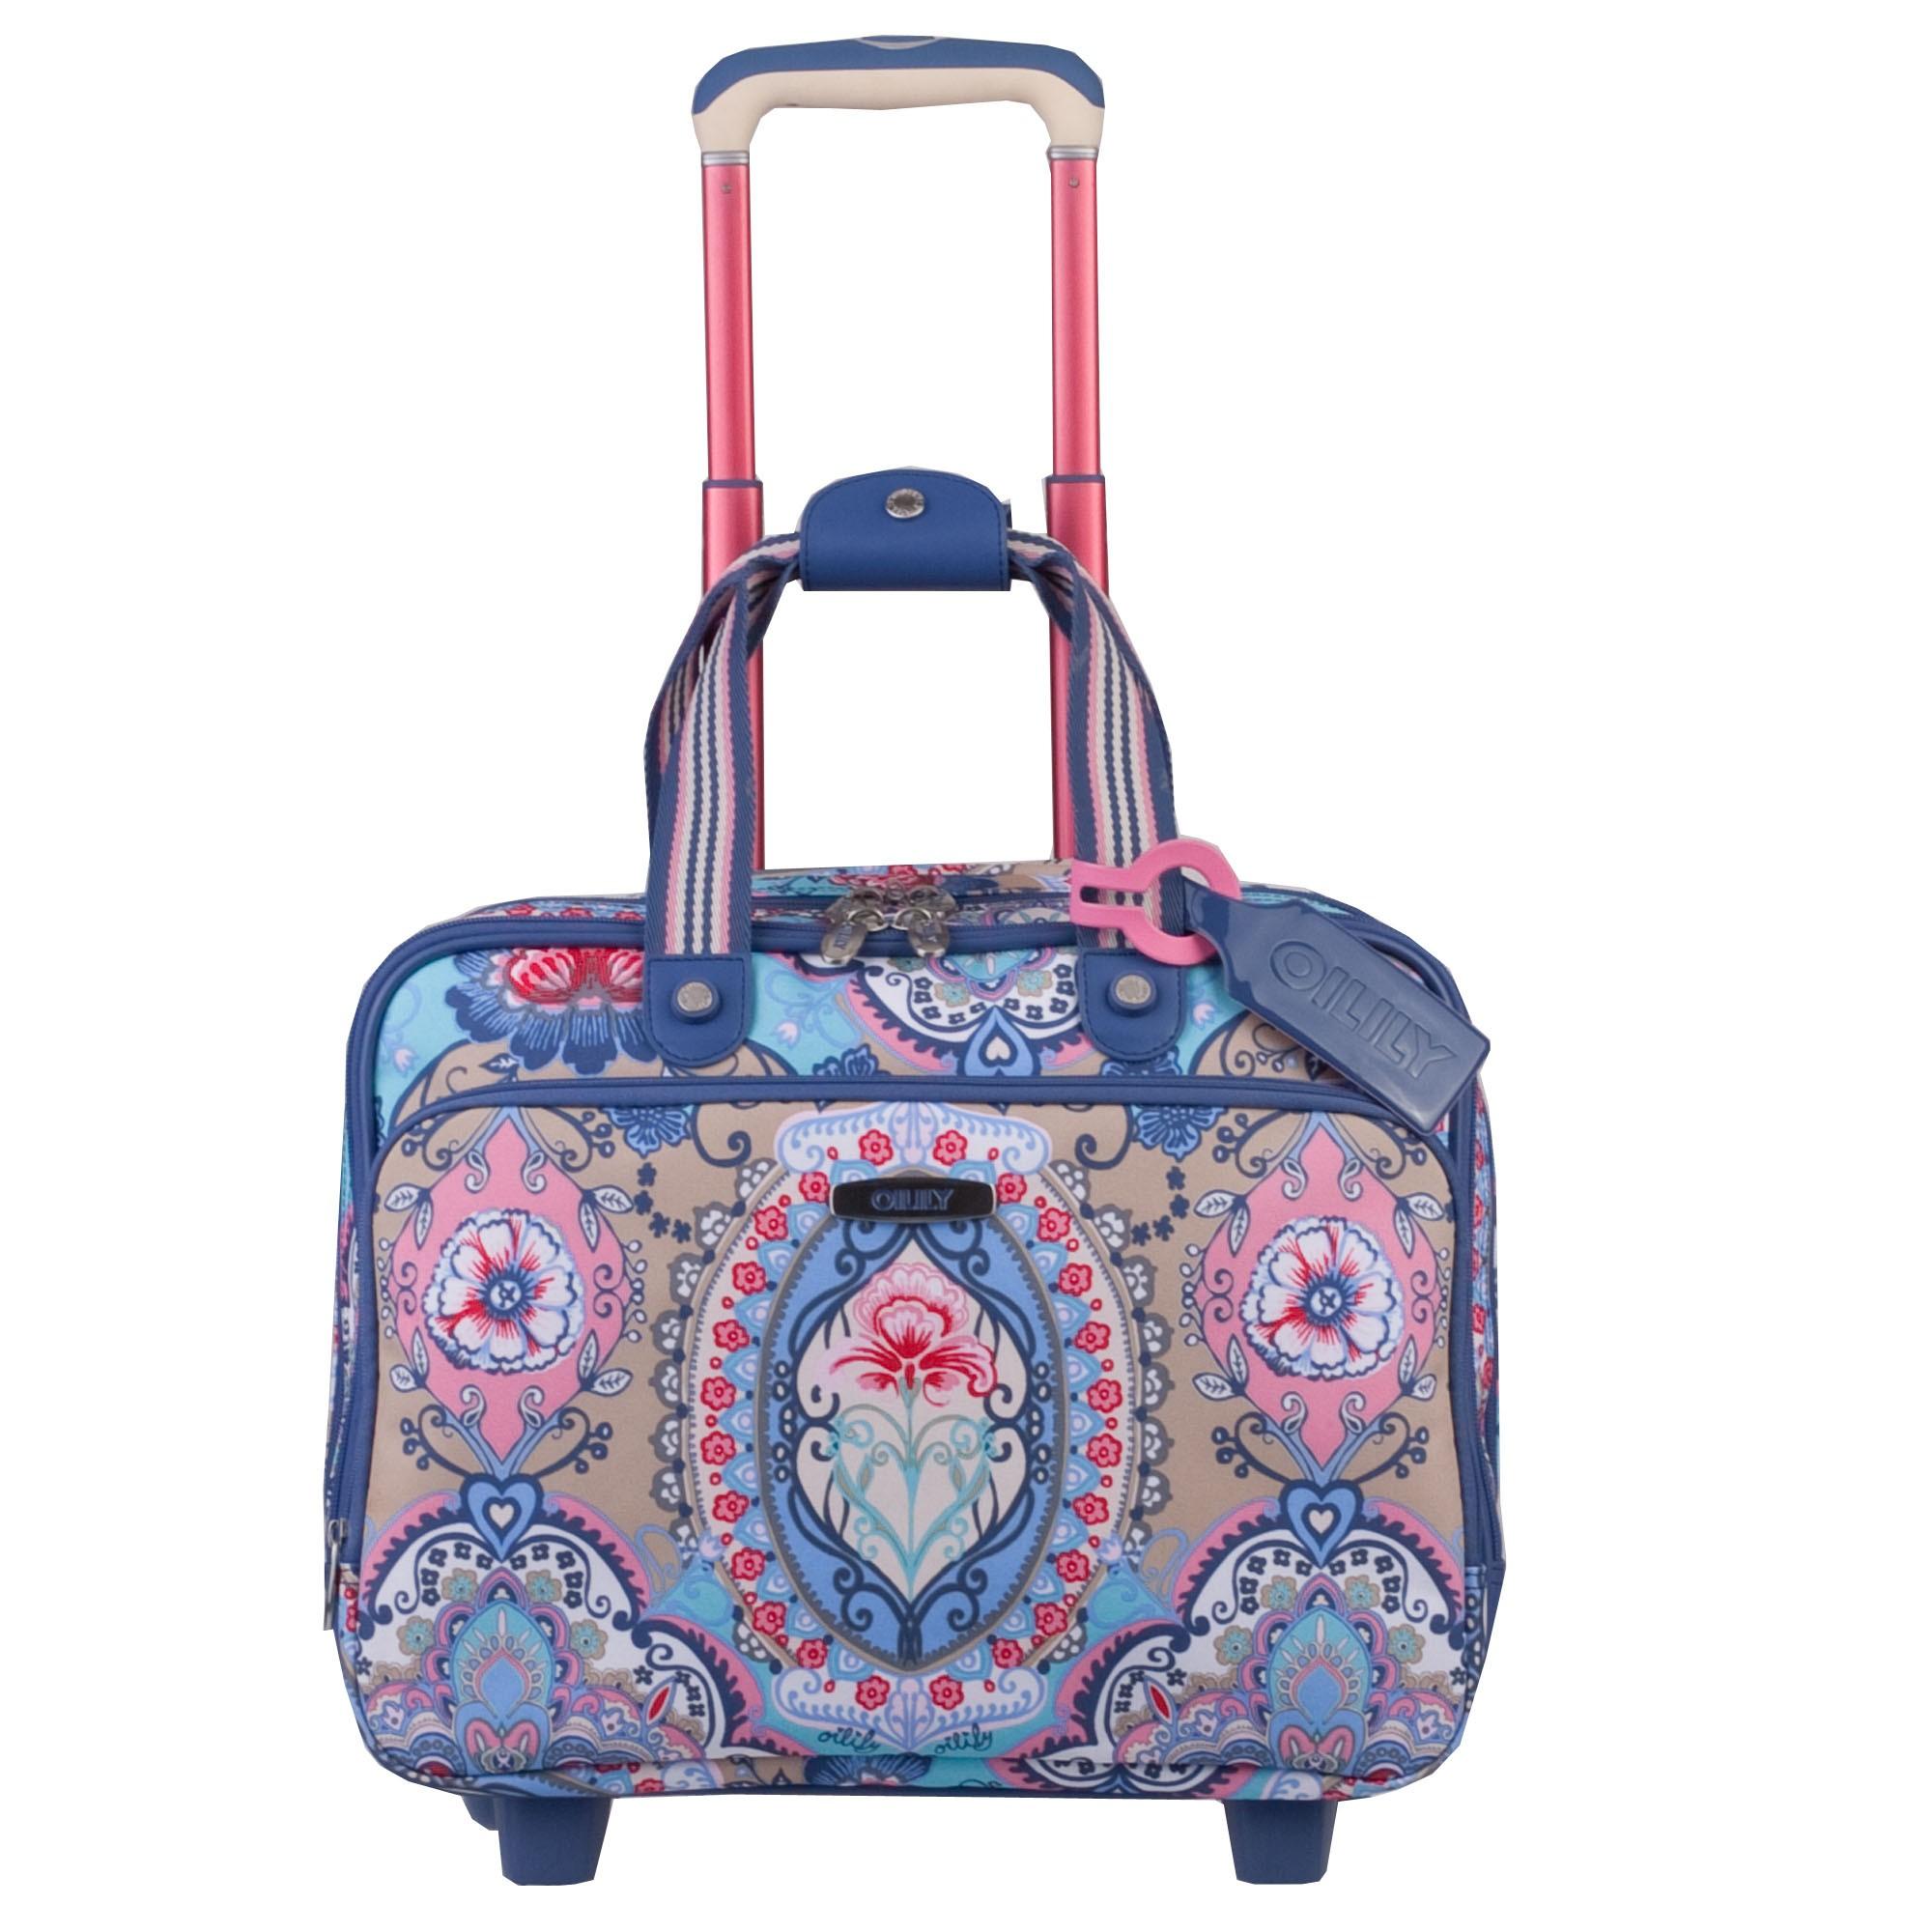 oilily travel 2013 lotus office bag on wheels laptopfach 2. Black Bedroom Furniture Sets. Home Design Ideas